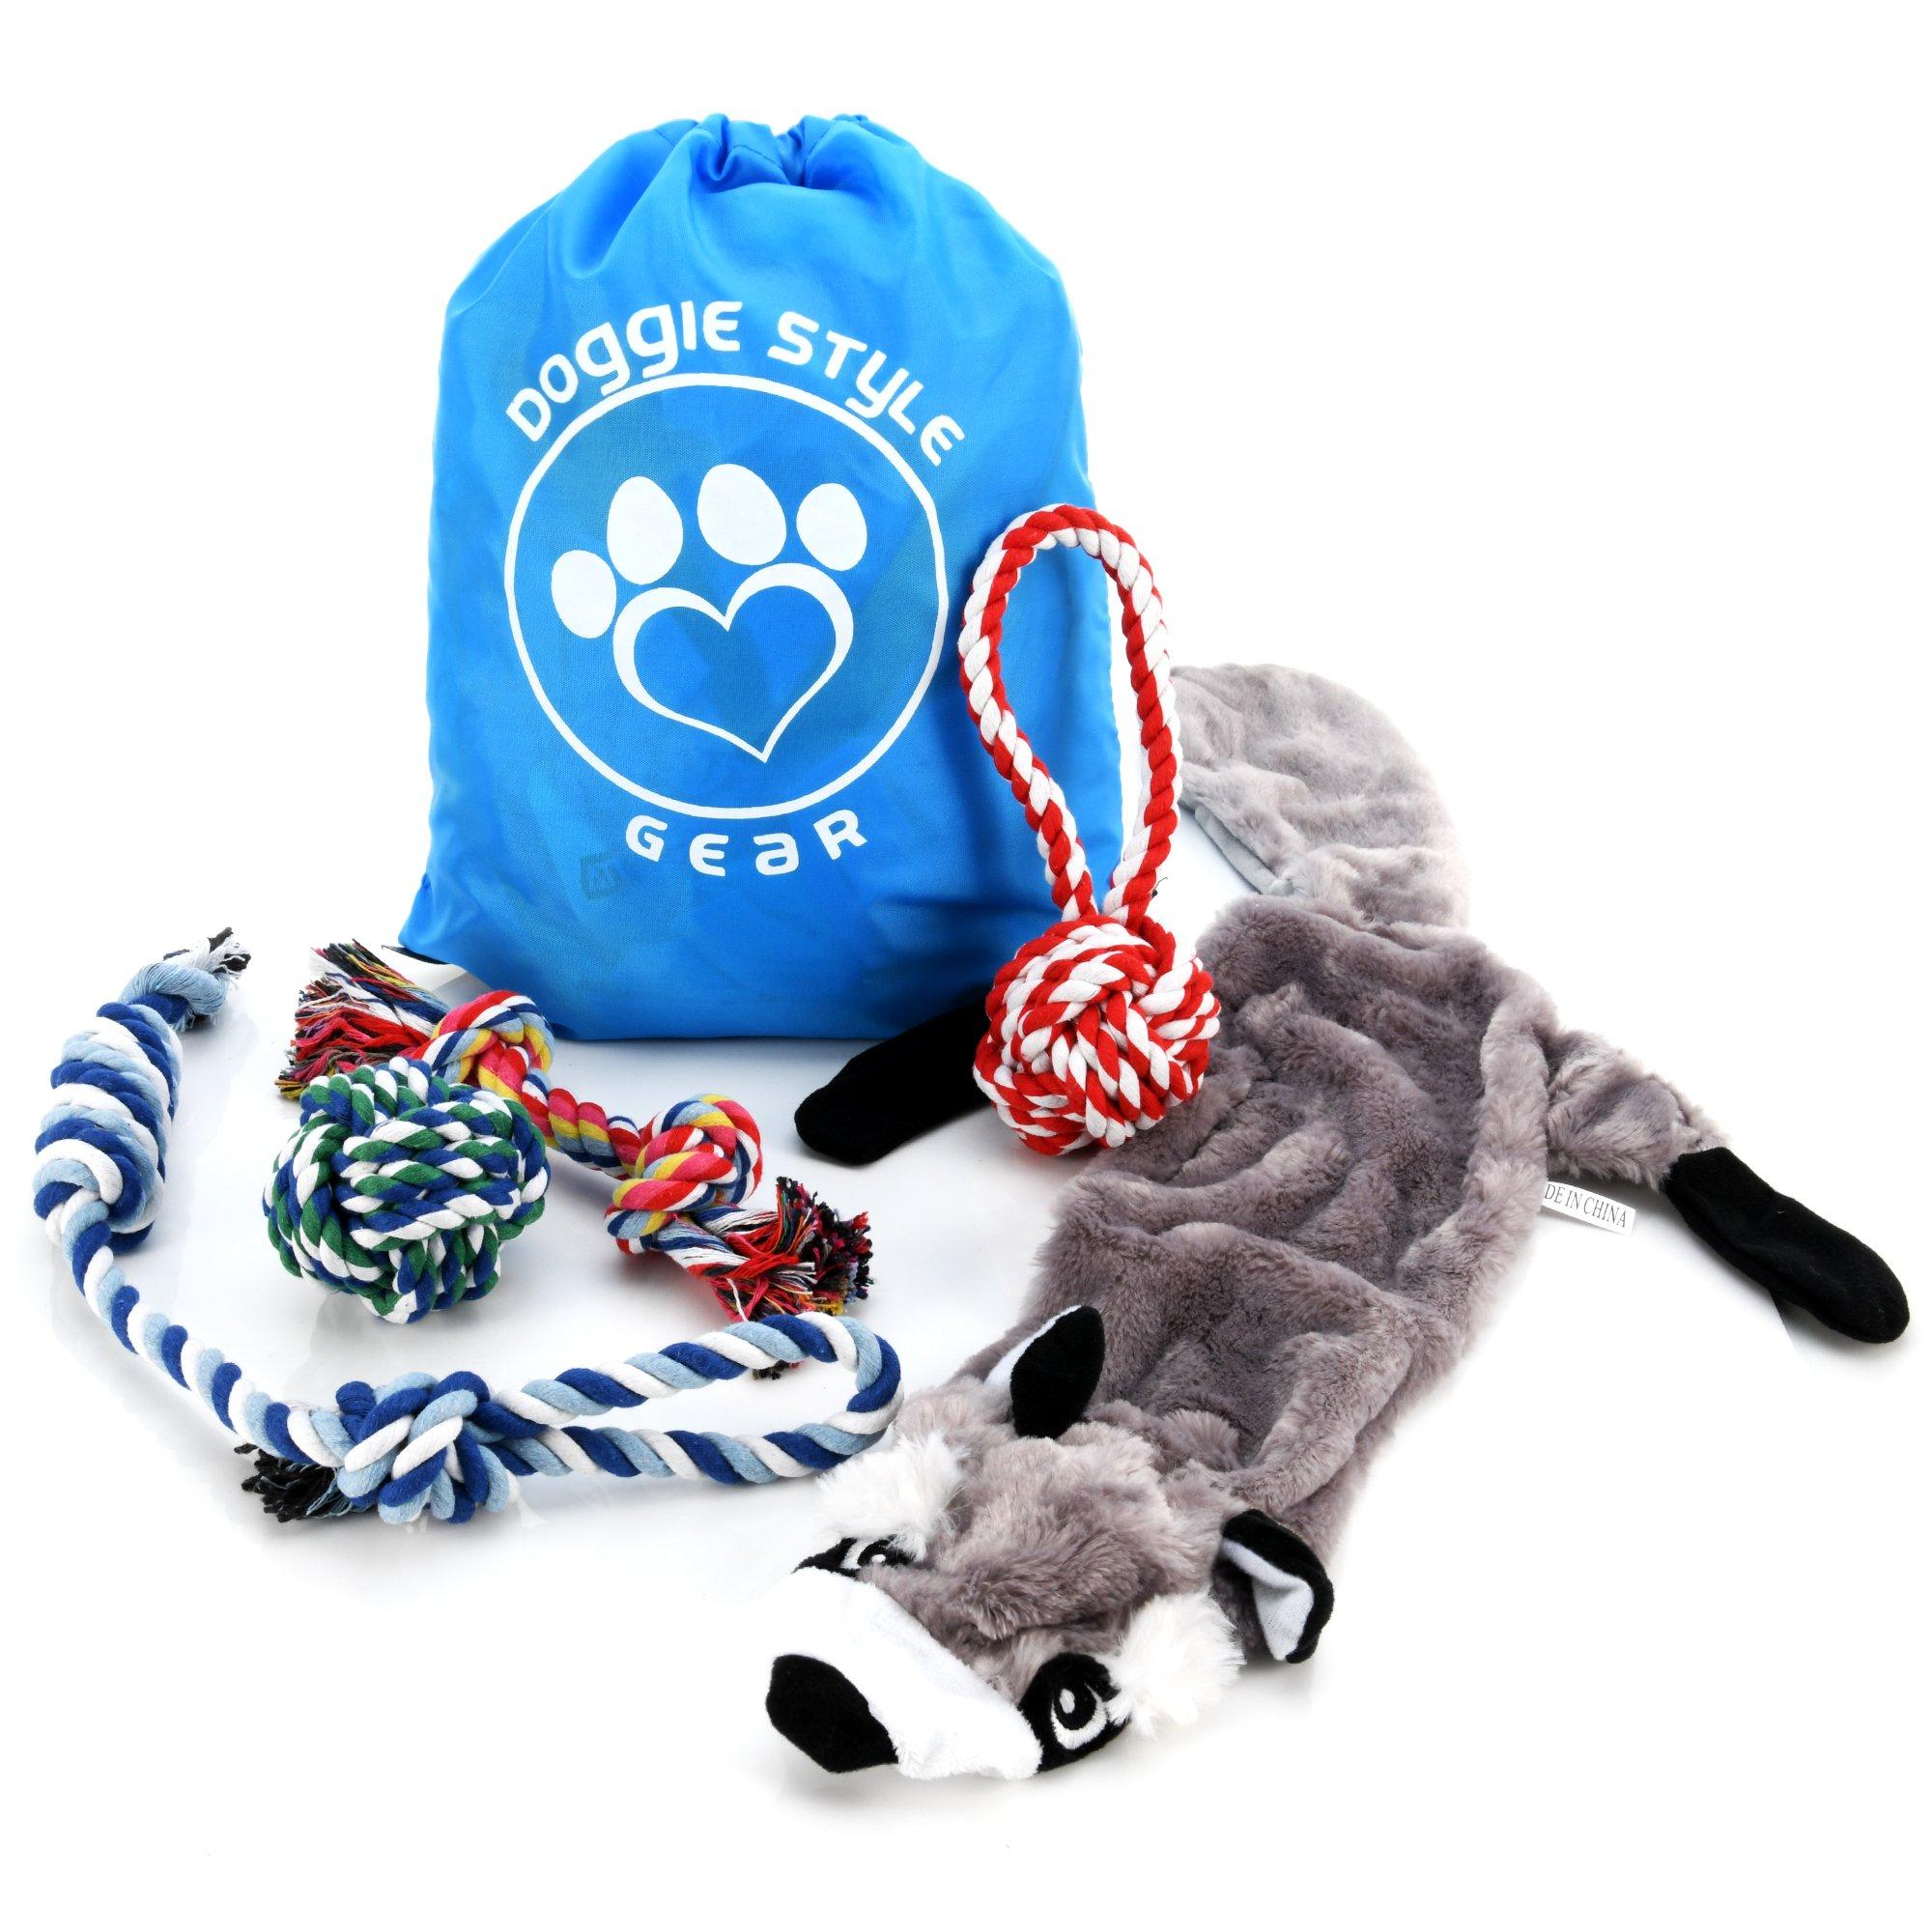 Dog Pet Rope Toys ◘ Tug-Of-War Playtime, 6 Pcs Includes Storage Bag